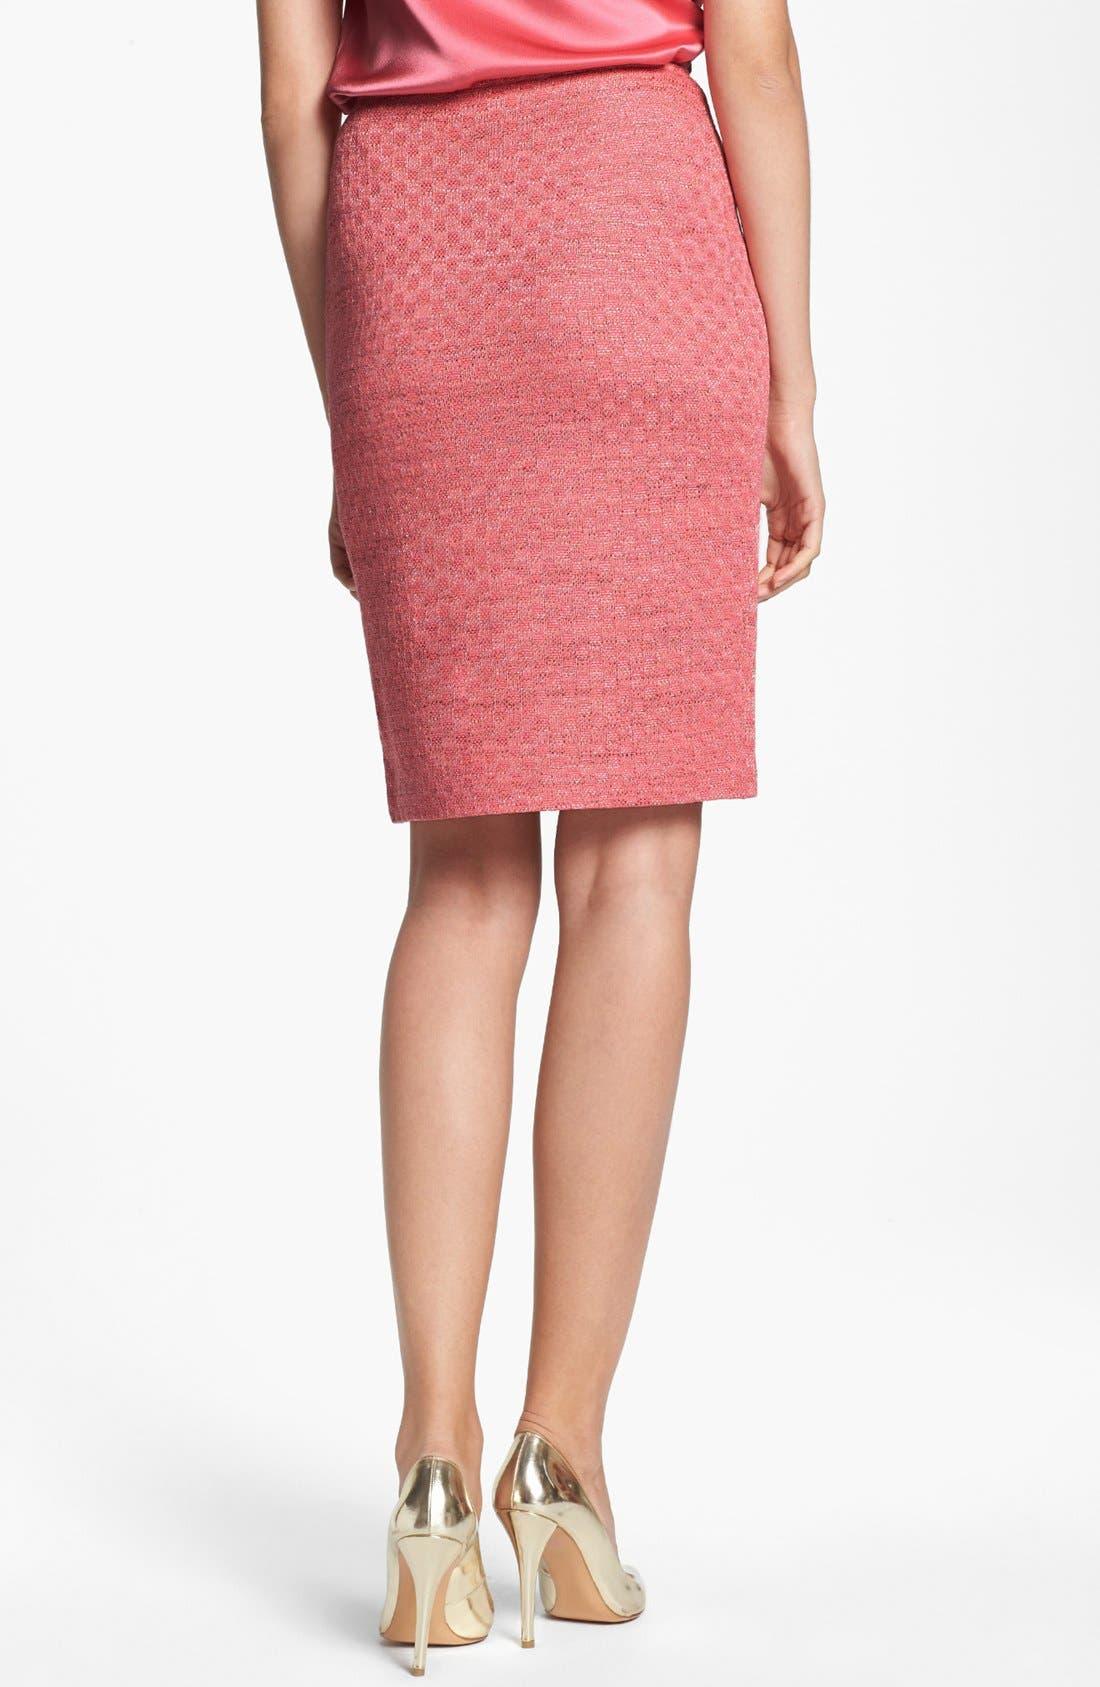 ST. JOHN COLLECTION, Damier Knit Pencil Skirt, Alternate thumbnail 3, color, 950